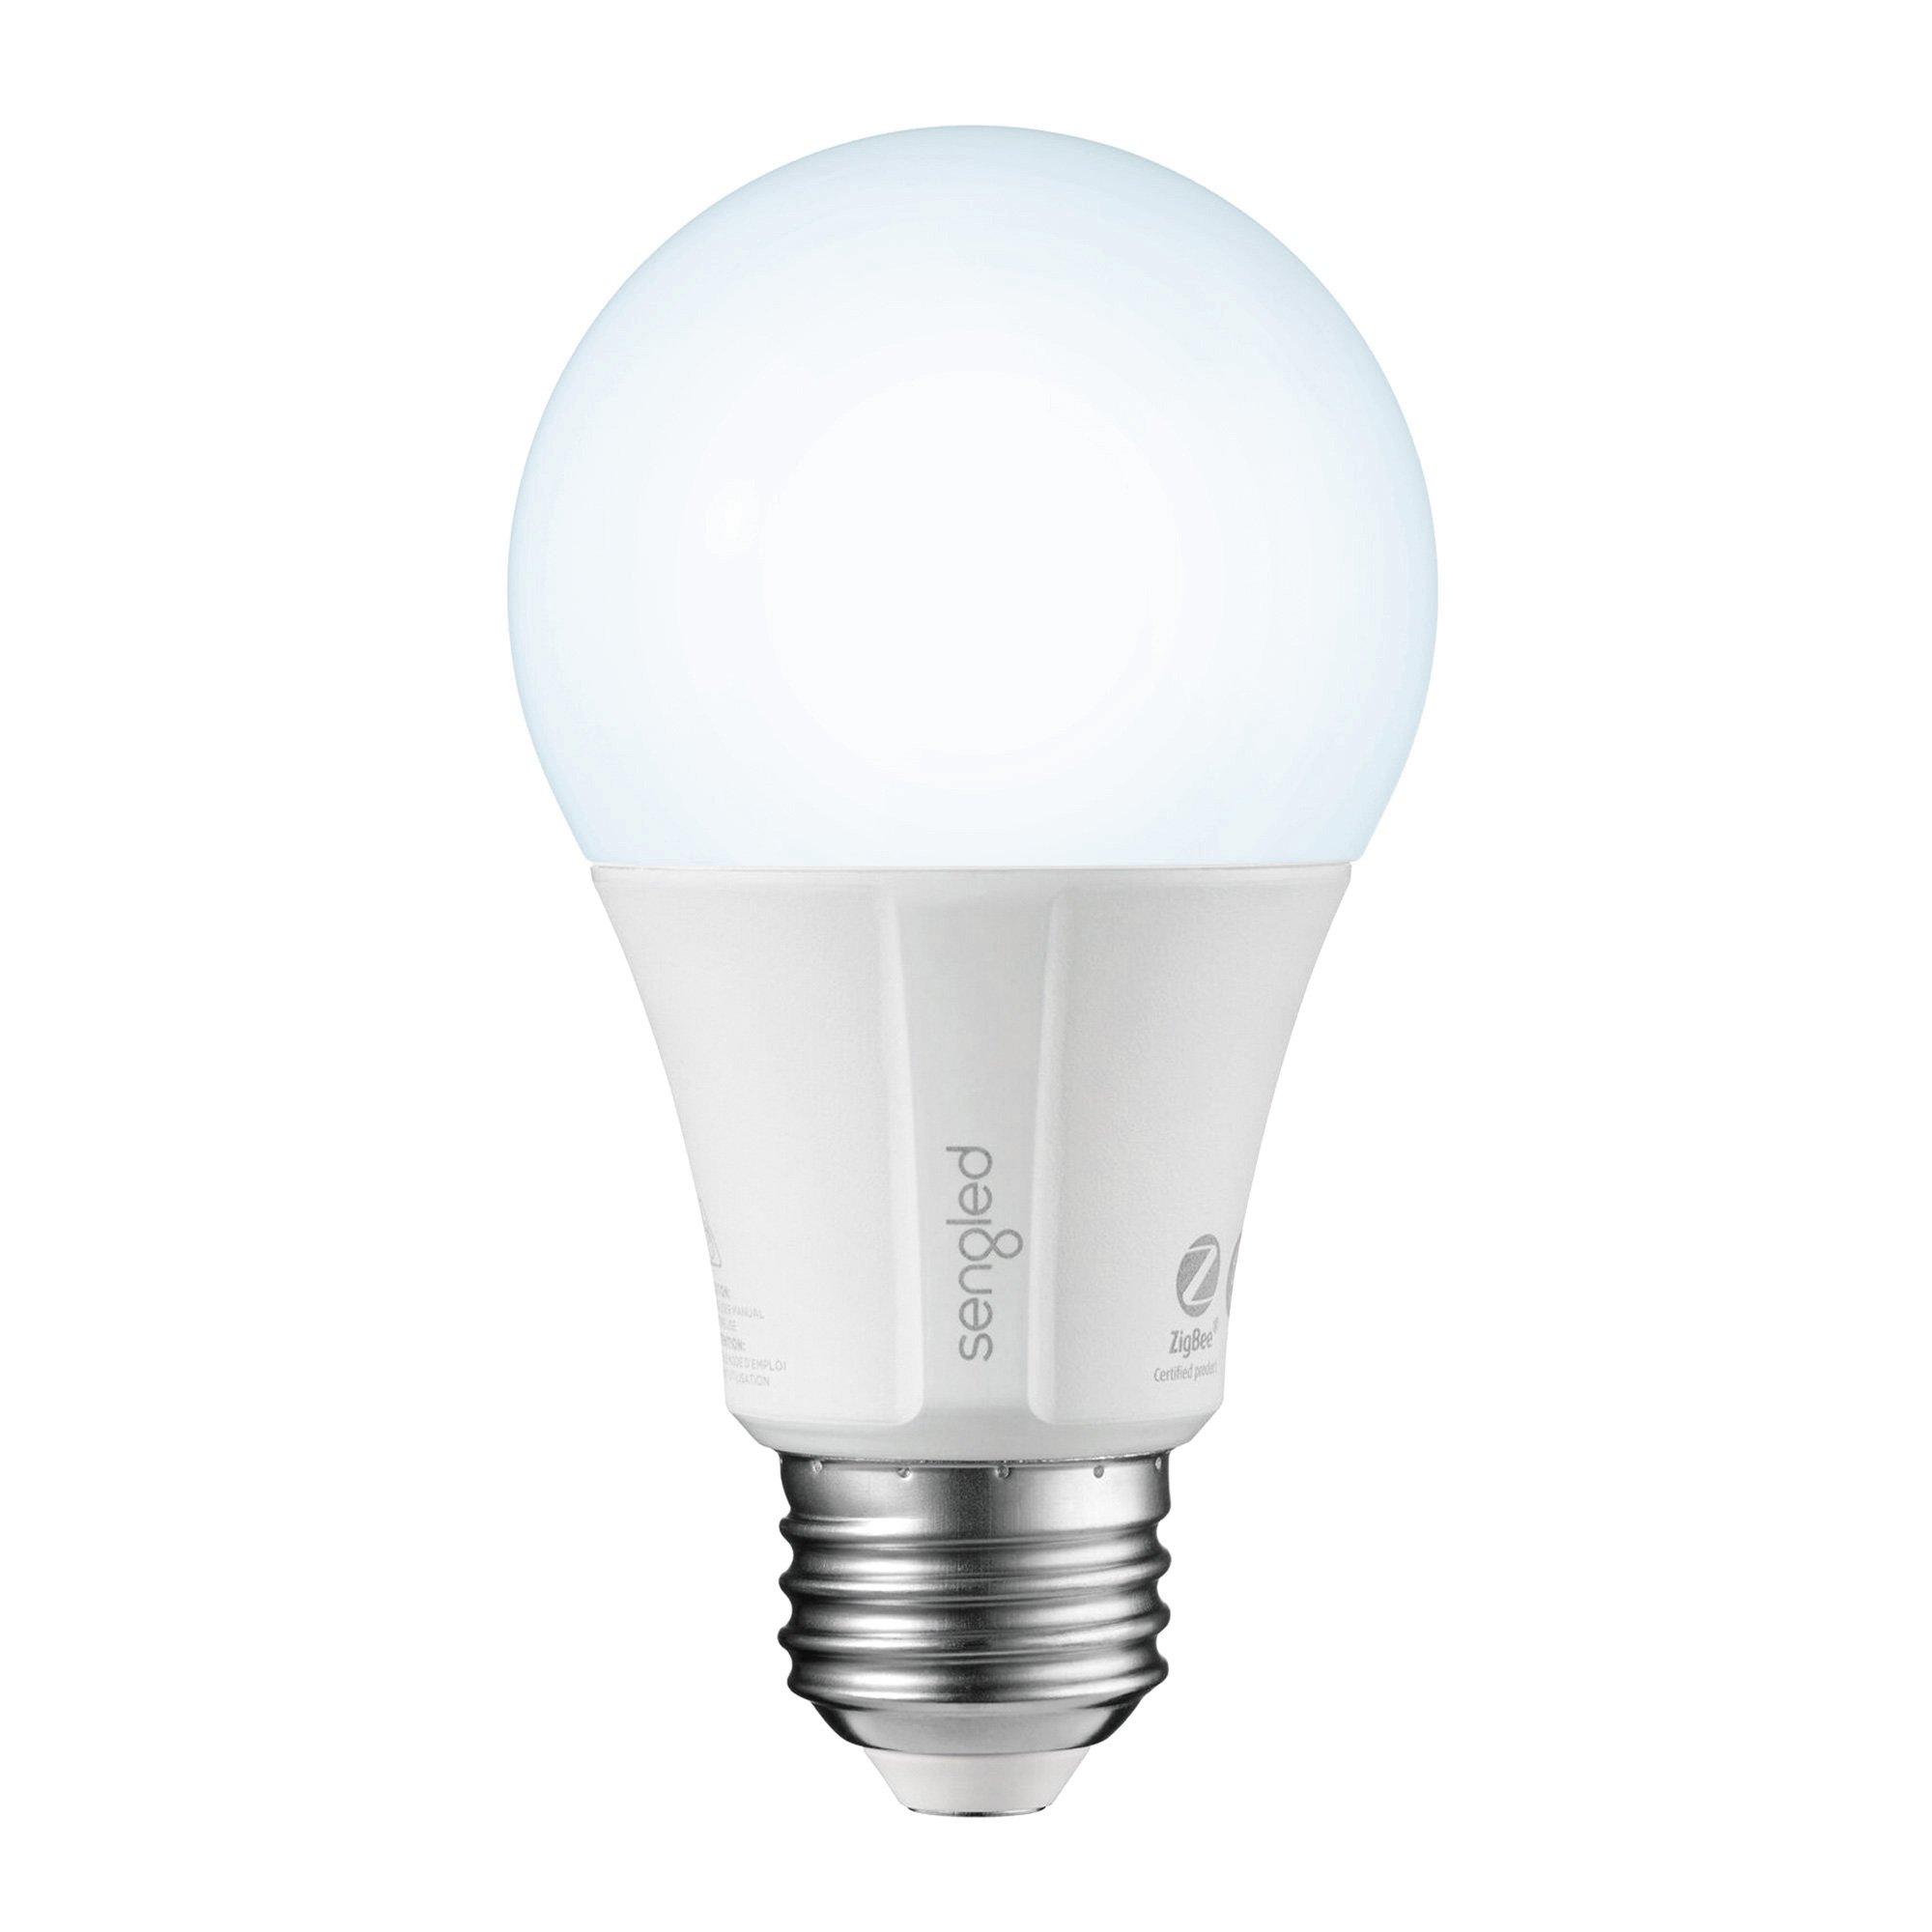 sengled element classic smart led light bulb hub required works with alexa echo plus. Black Bedroom Furniture Sets. Home Design Ideas